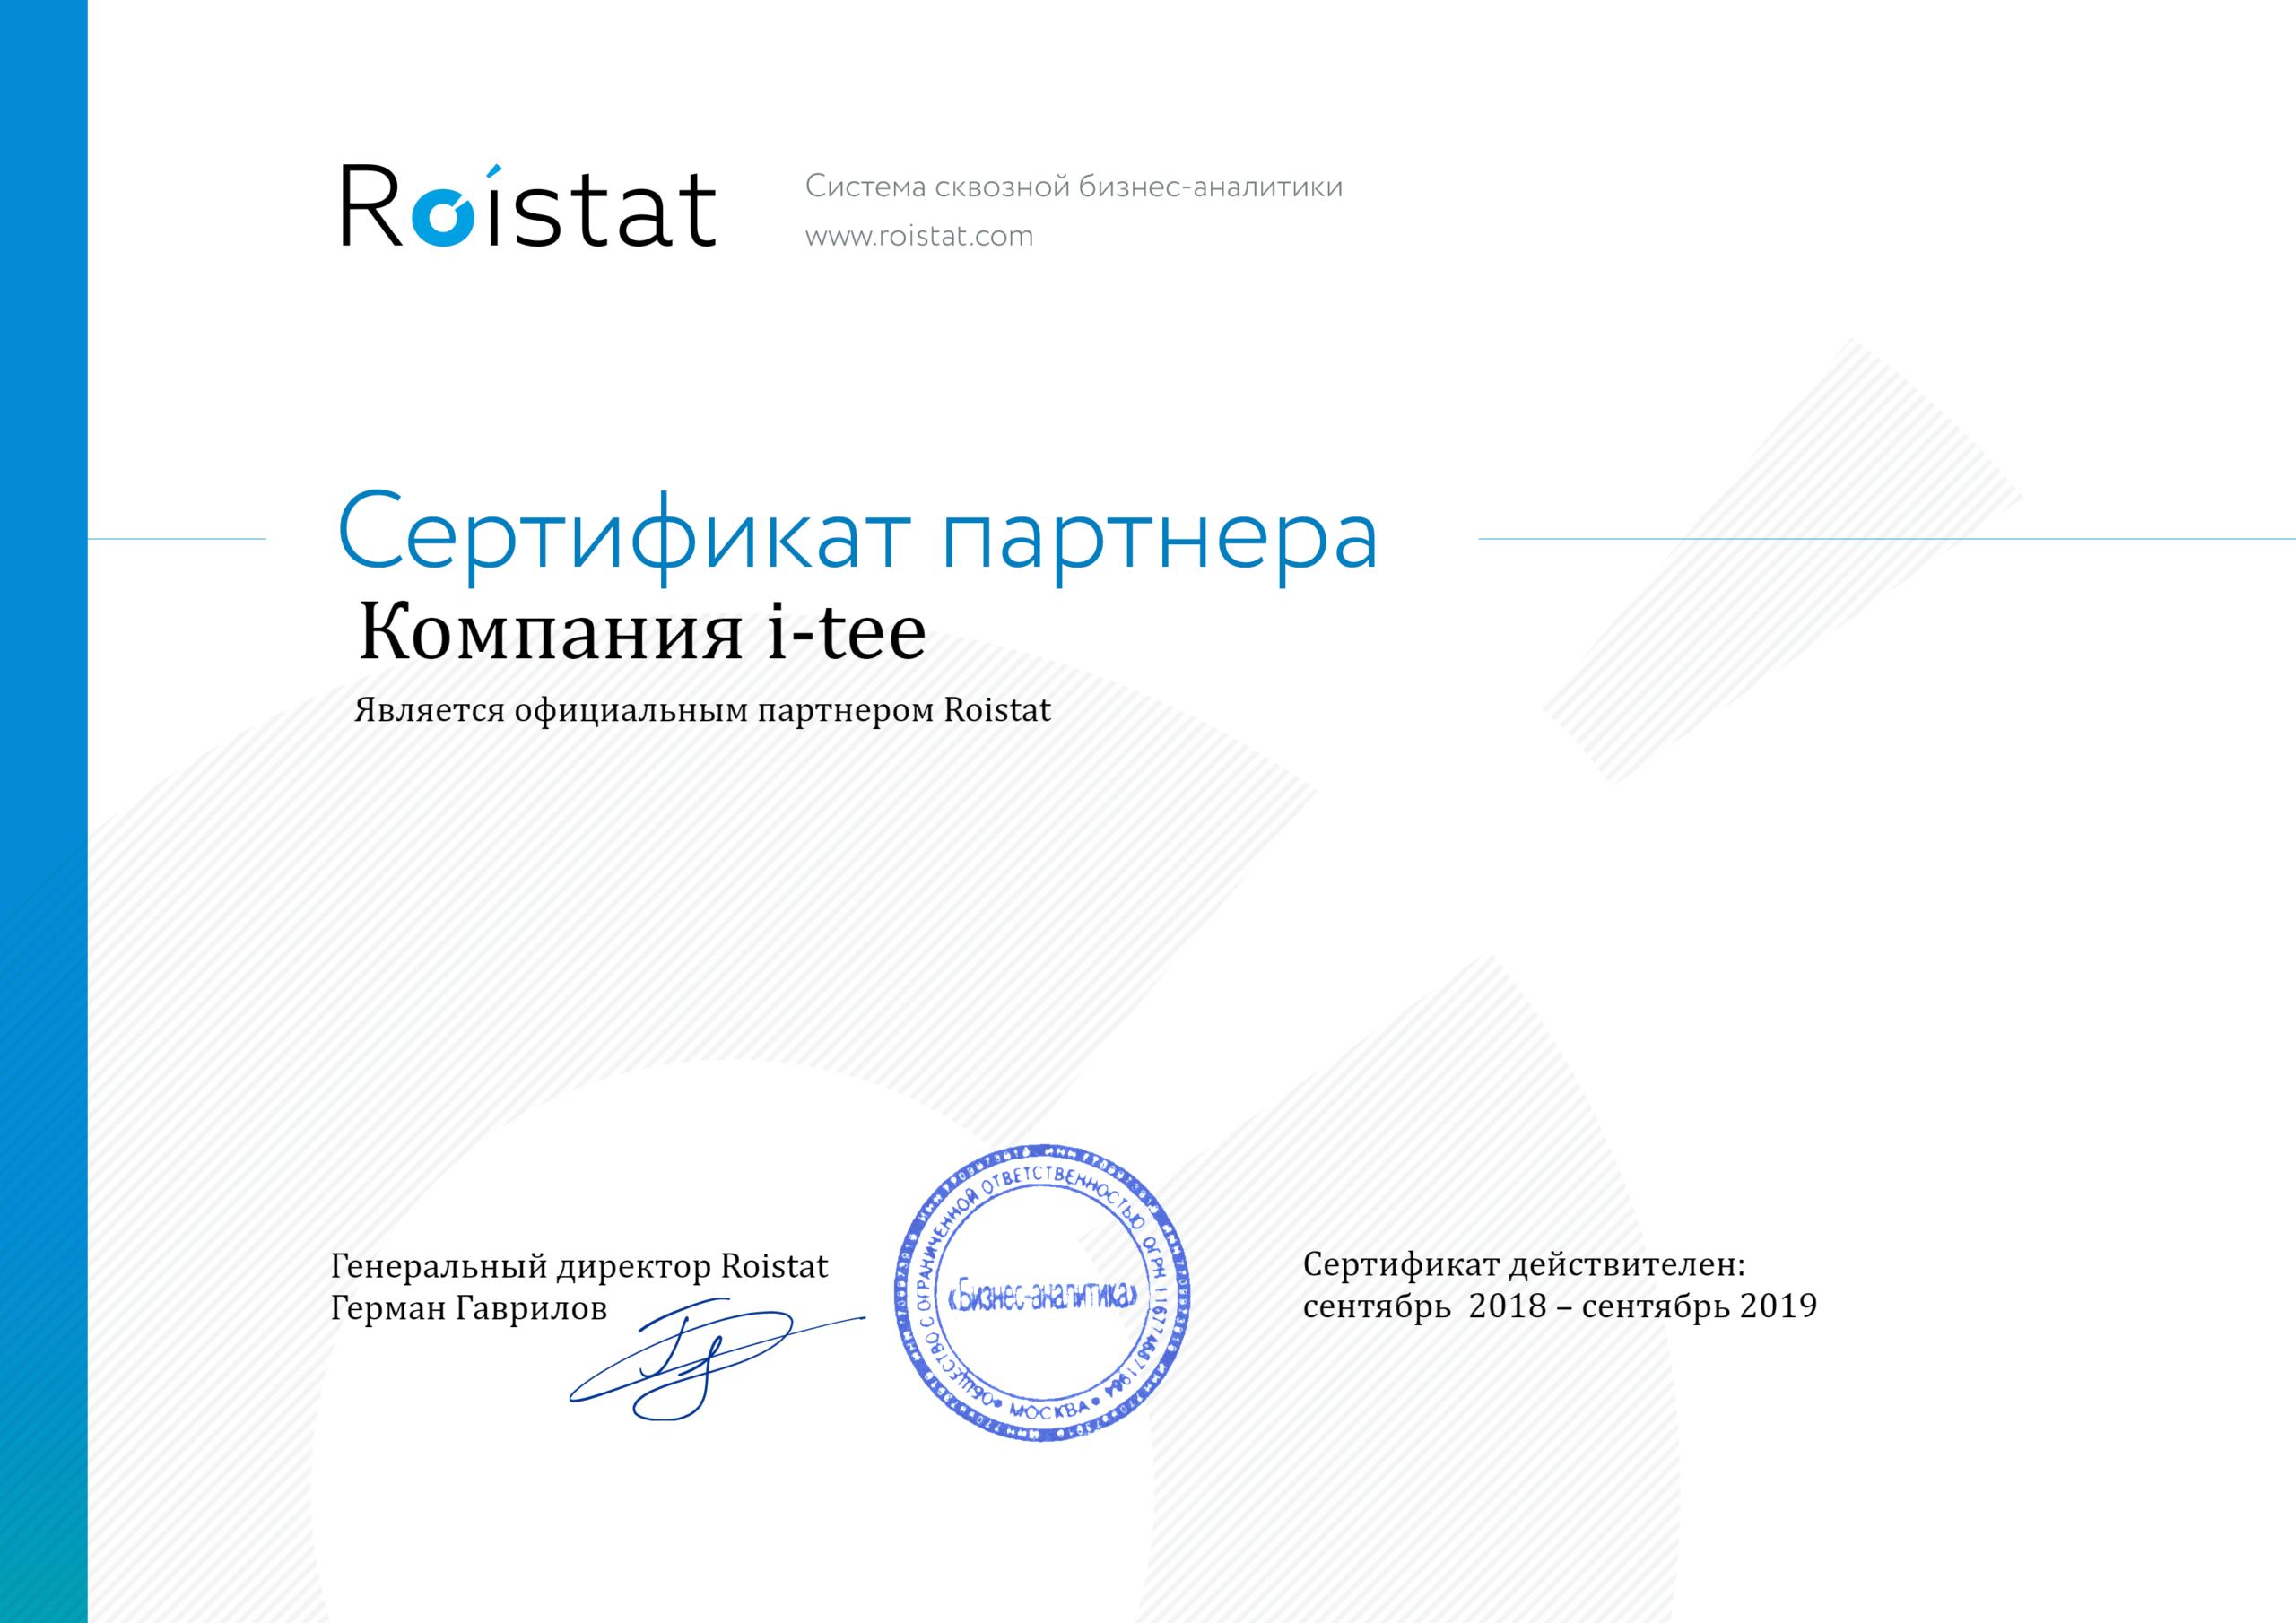 Сертификат партнера RoiStat i-tee